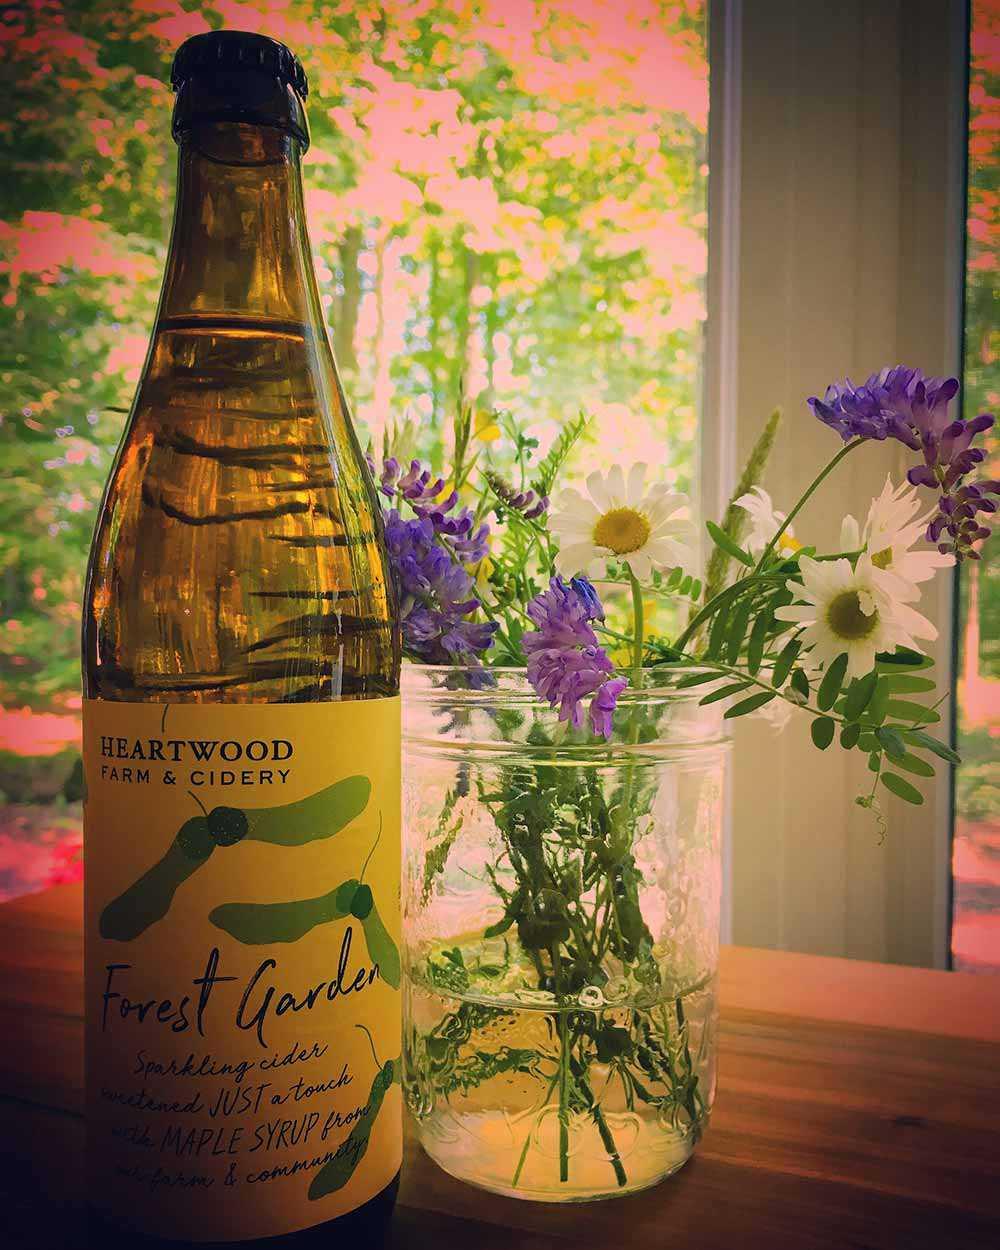 Heartwood Farm & Cidery